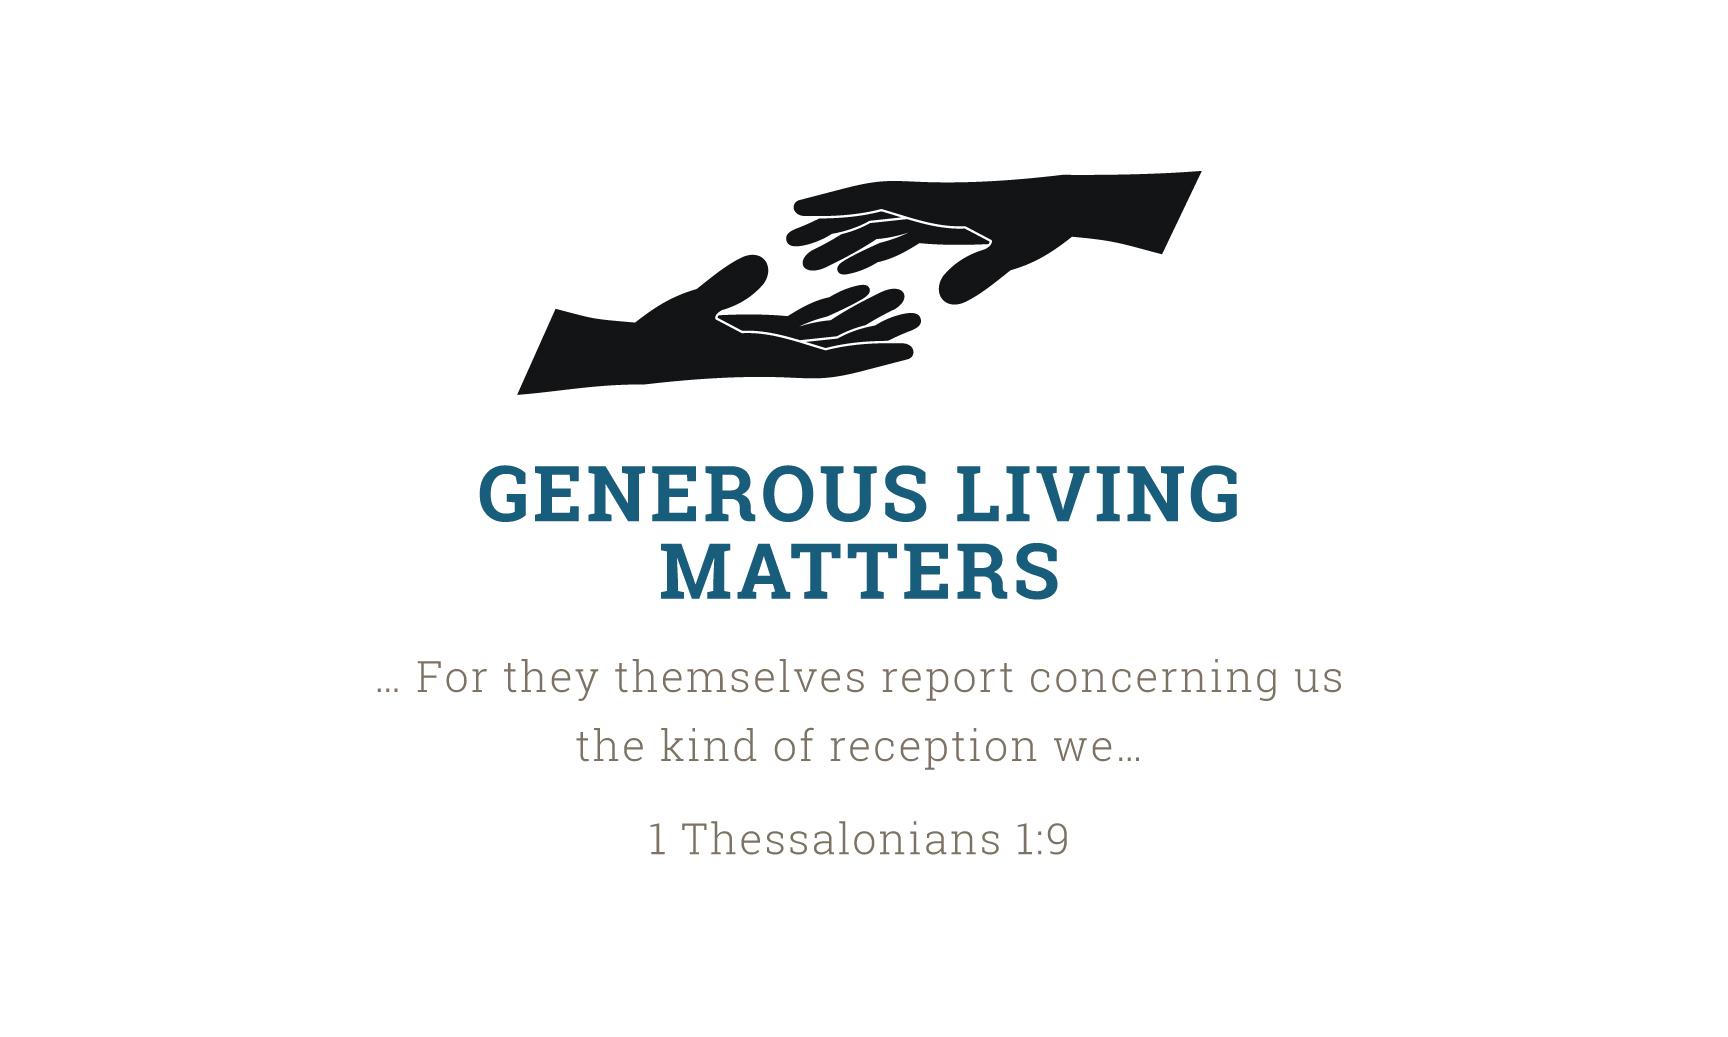 Generous-Living-Matters.jpg